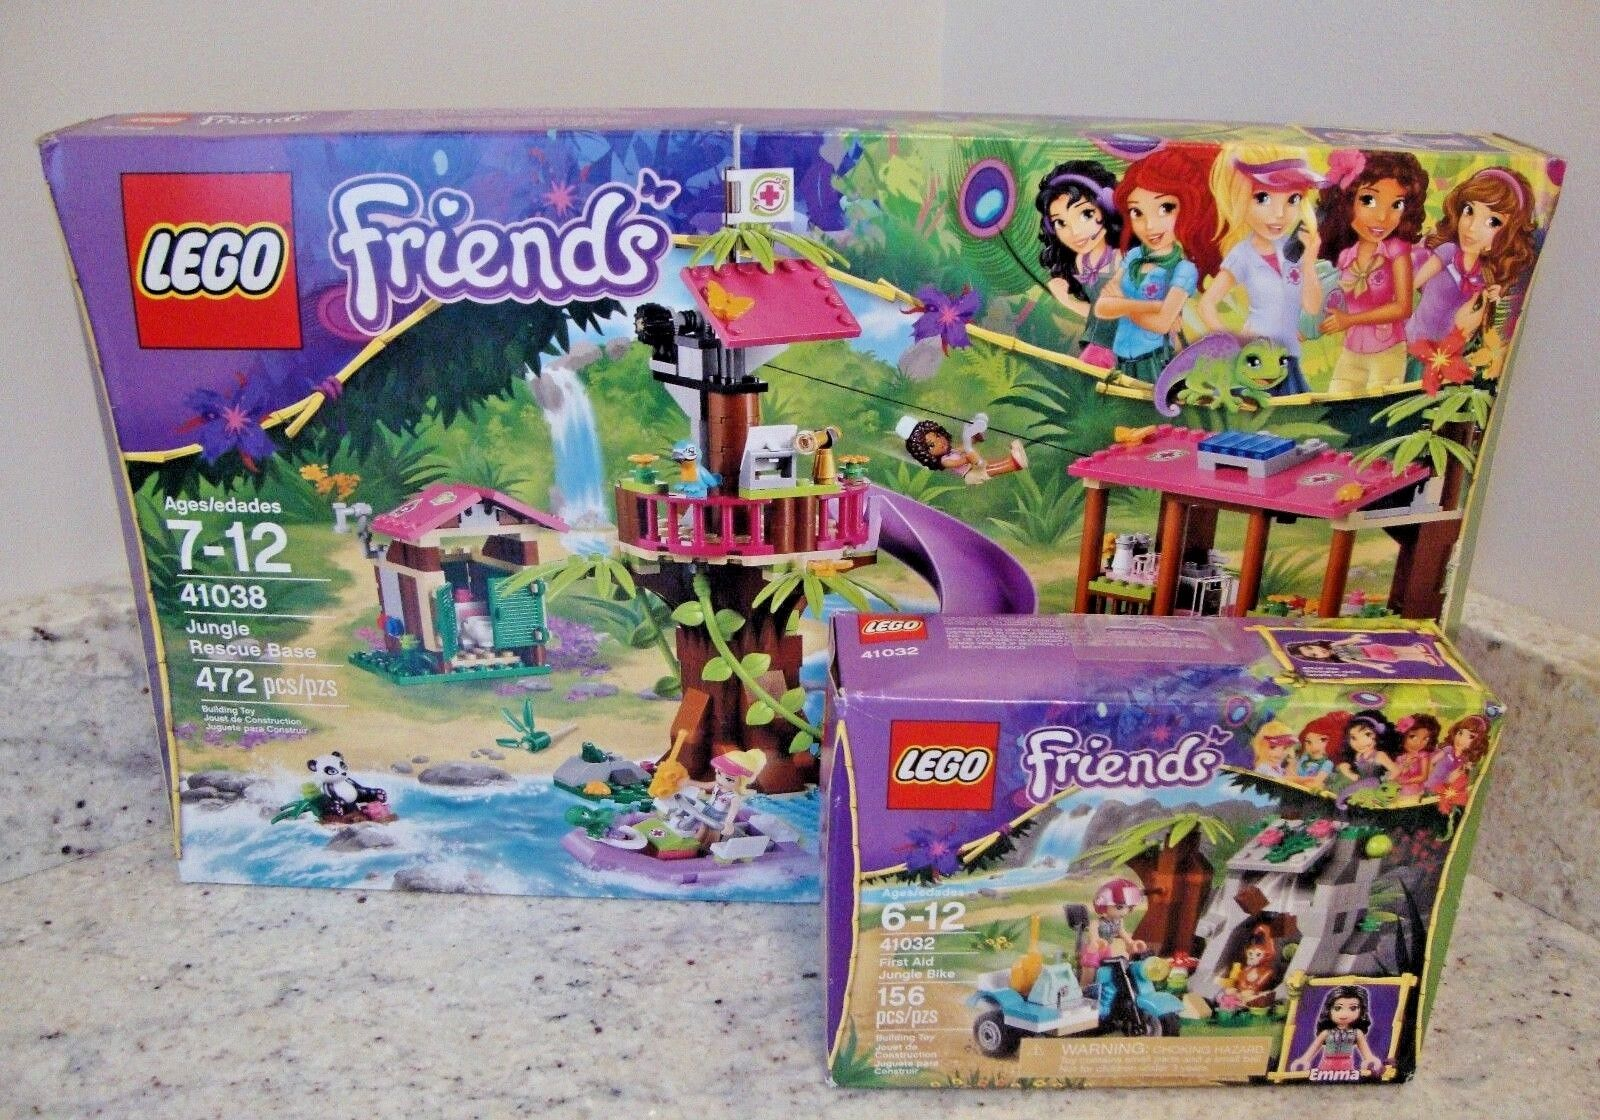 LEGO FRIENDS JUNGLE RESCUE BASE SET  41038 w/ BIKE SET  41032 - Imperfect Boxes